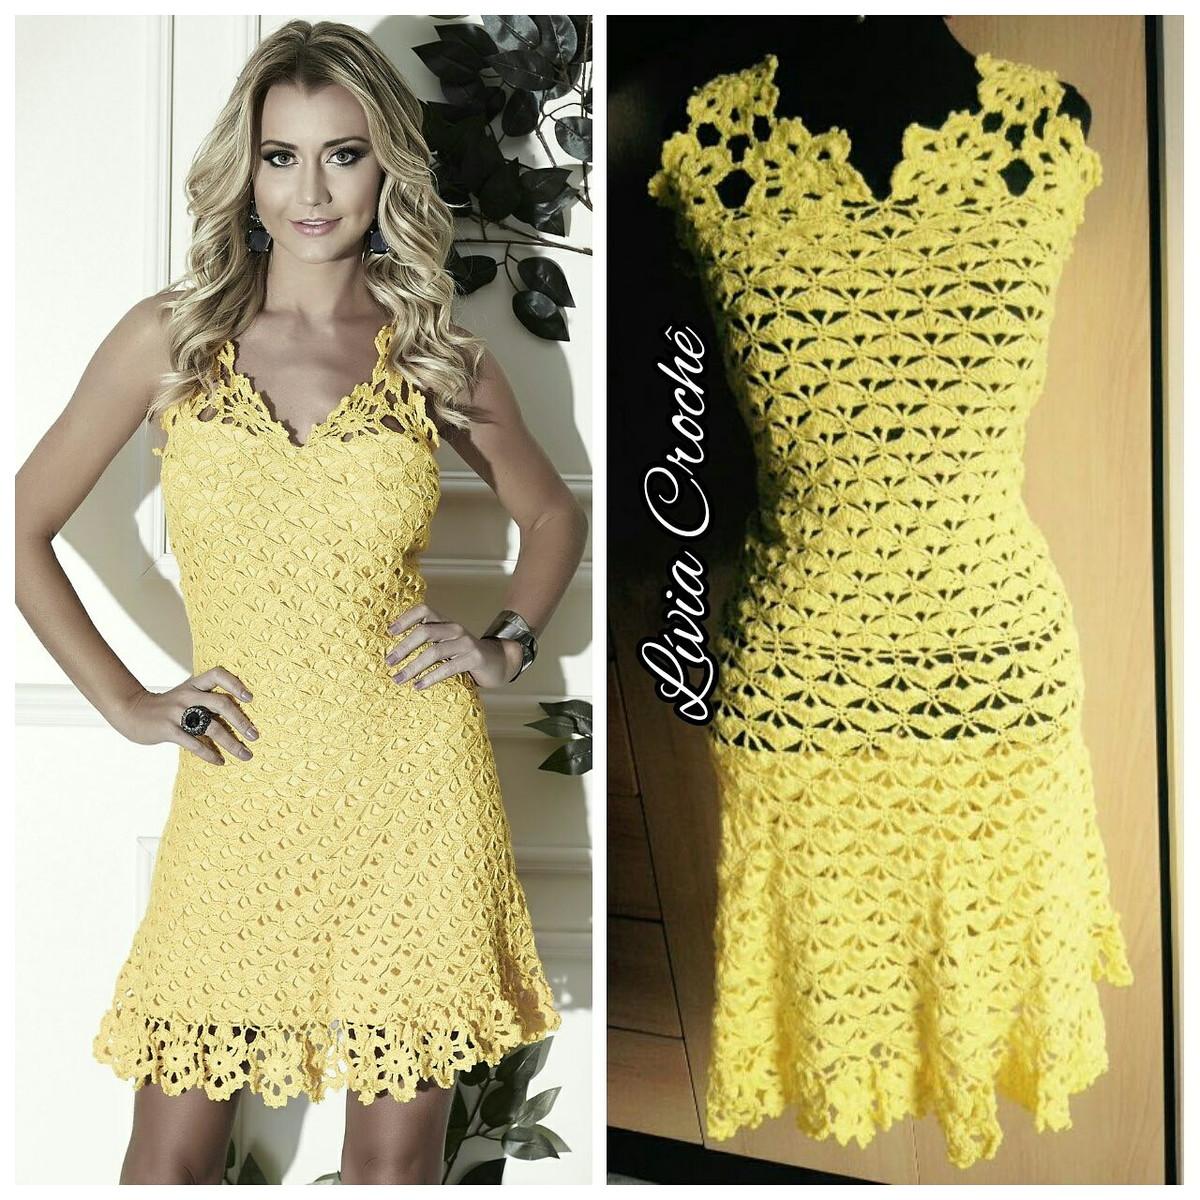 32337c25d Vestido Amarelo Anne no Elo7 | Lívia Crochê (9C5ED0)